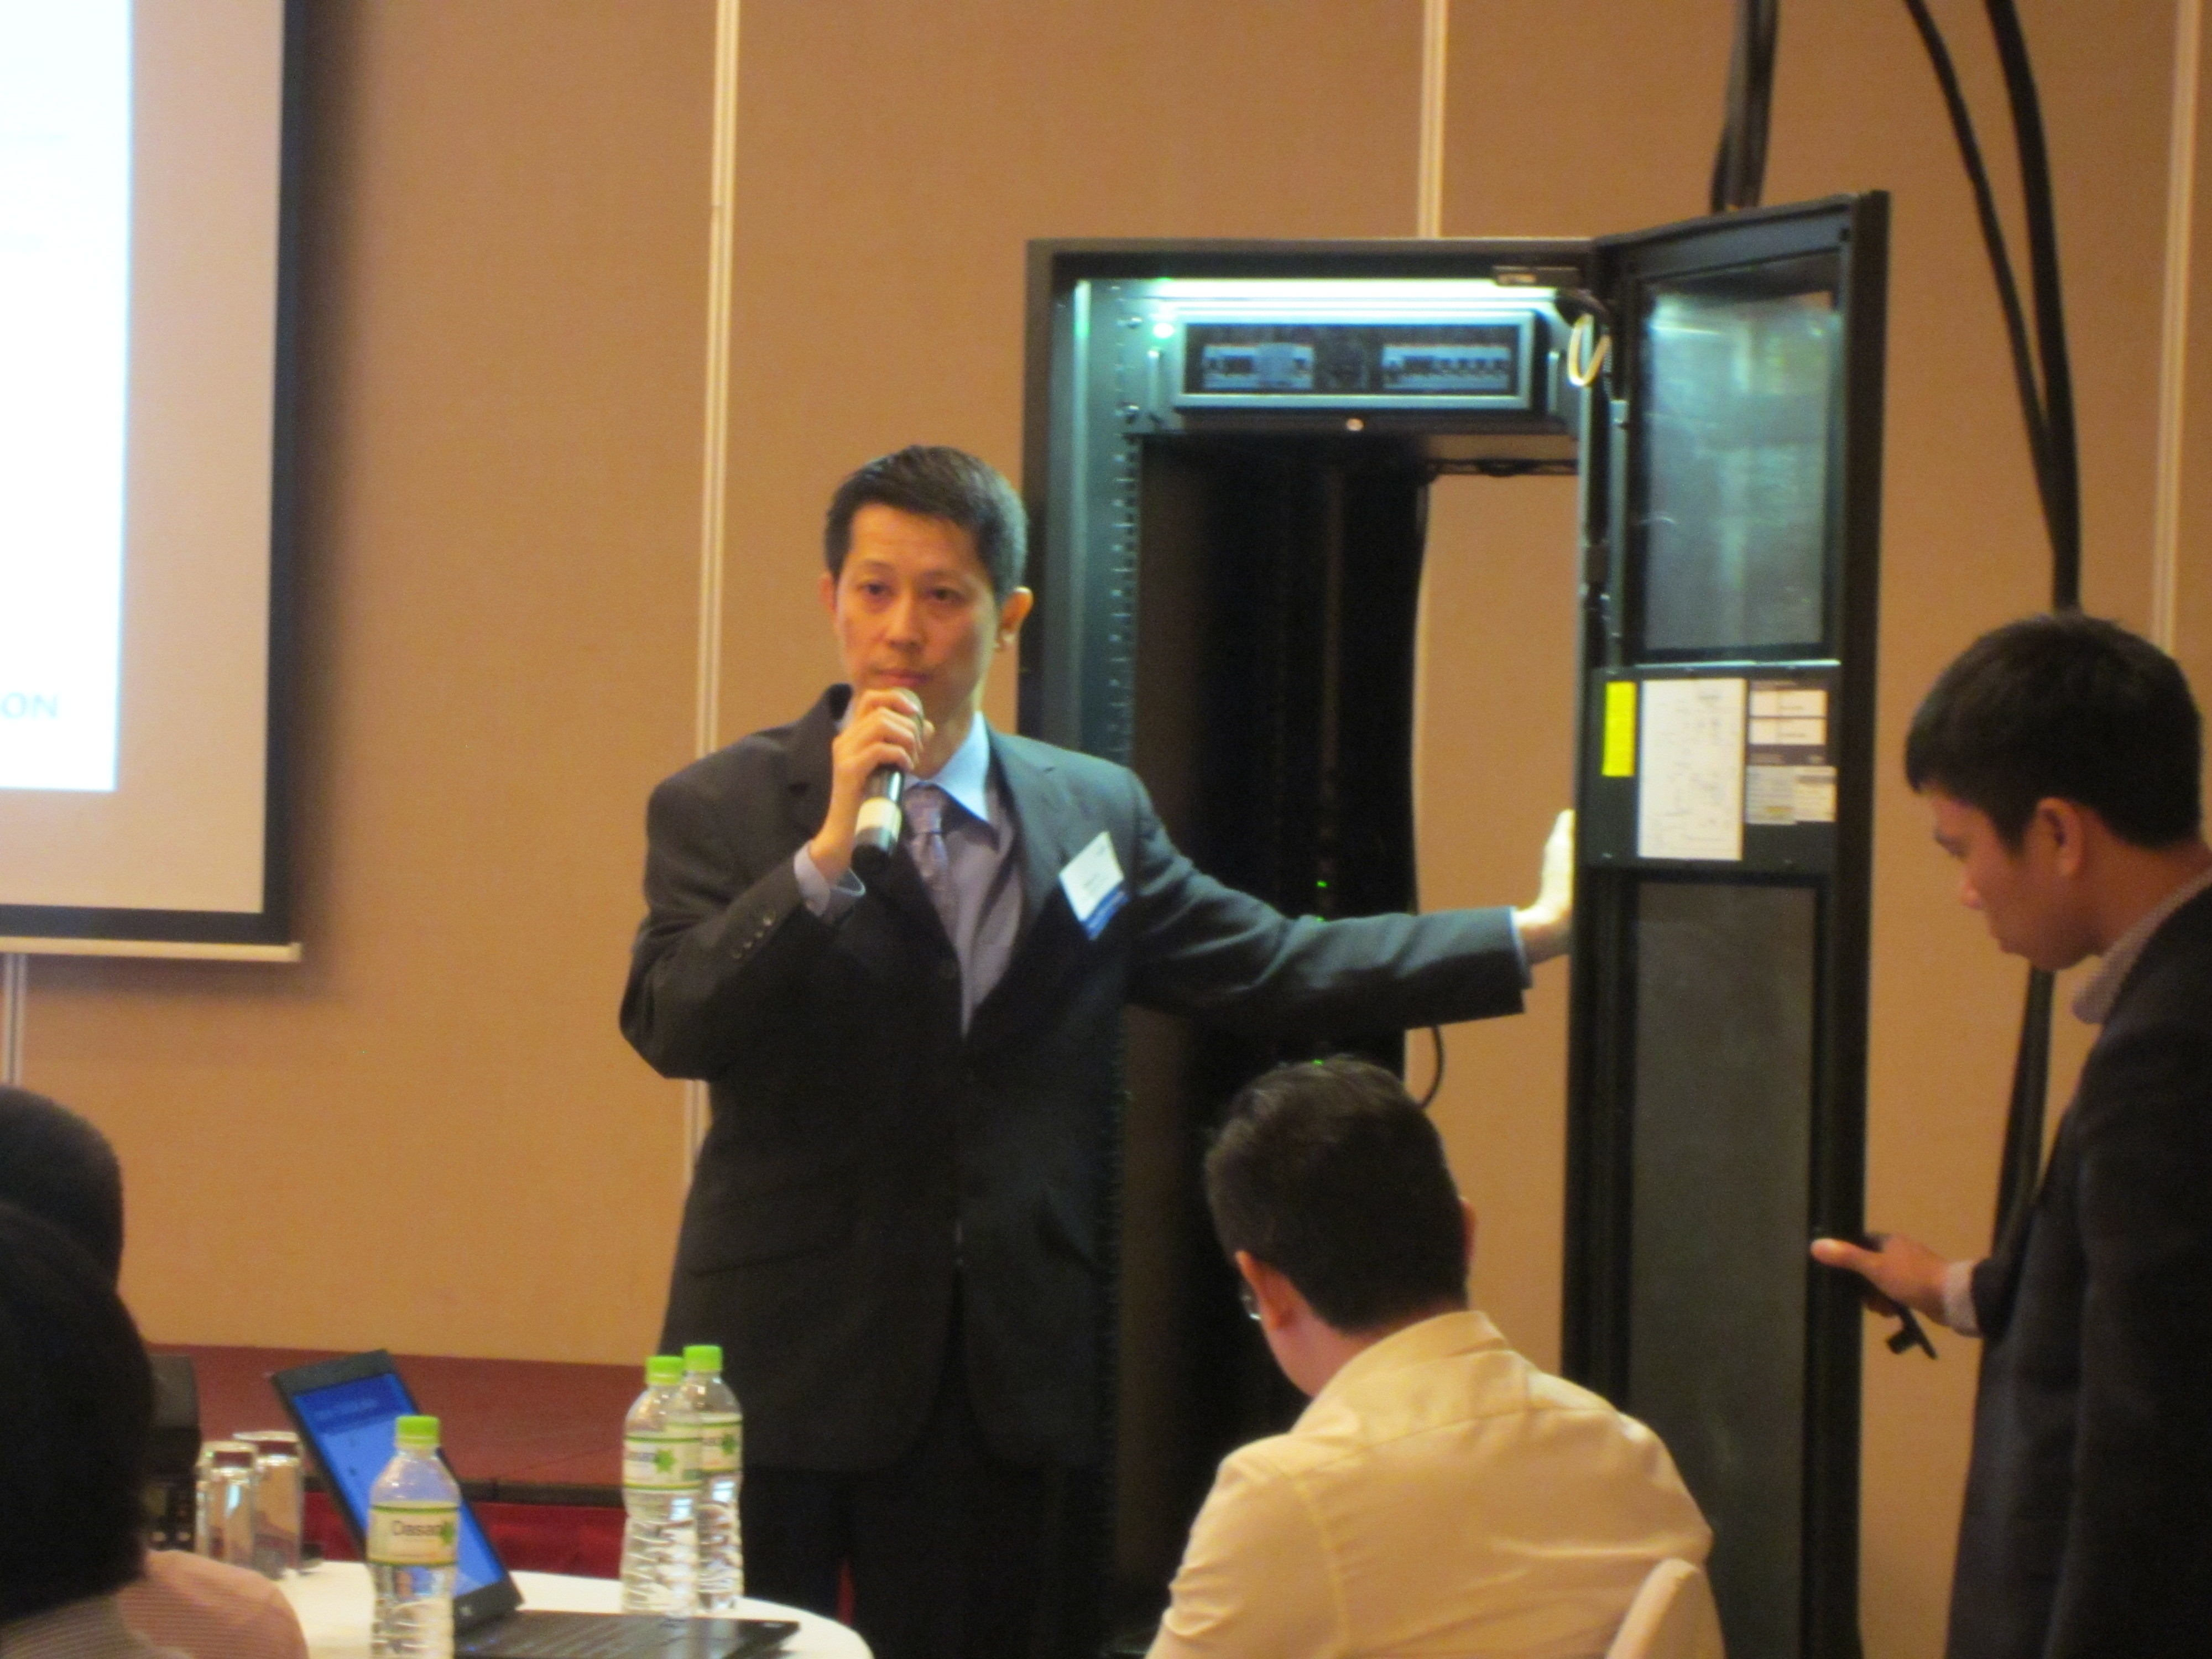 Gioi Thieu San Pham SmartCarbinet - Emerson Network Power ra mắt SmartCabinet tại Việt Nam